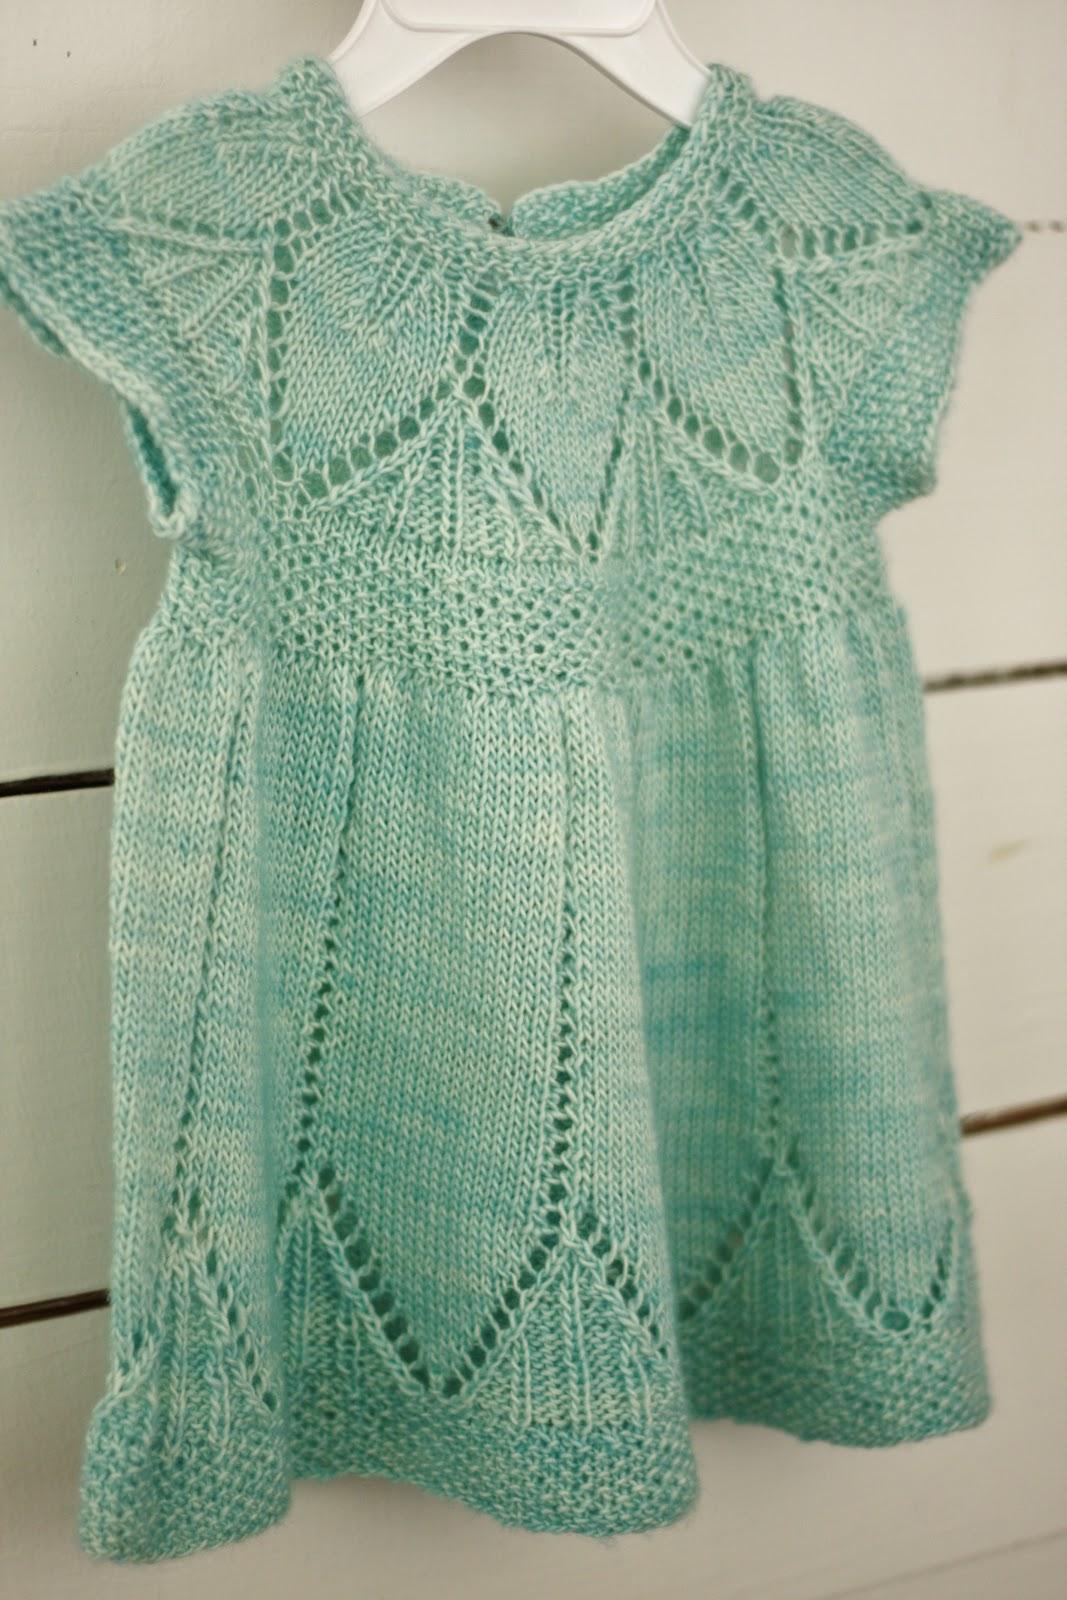 Clara Dress Knitting Pattern : The Brick Street Bungalow: Knitting Review 2012